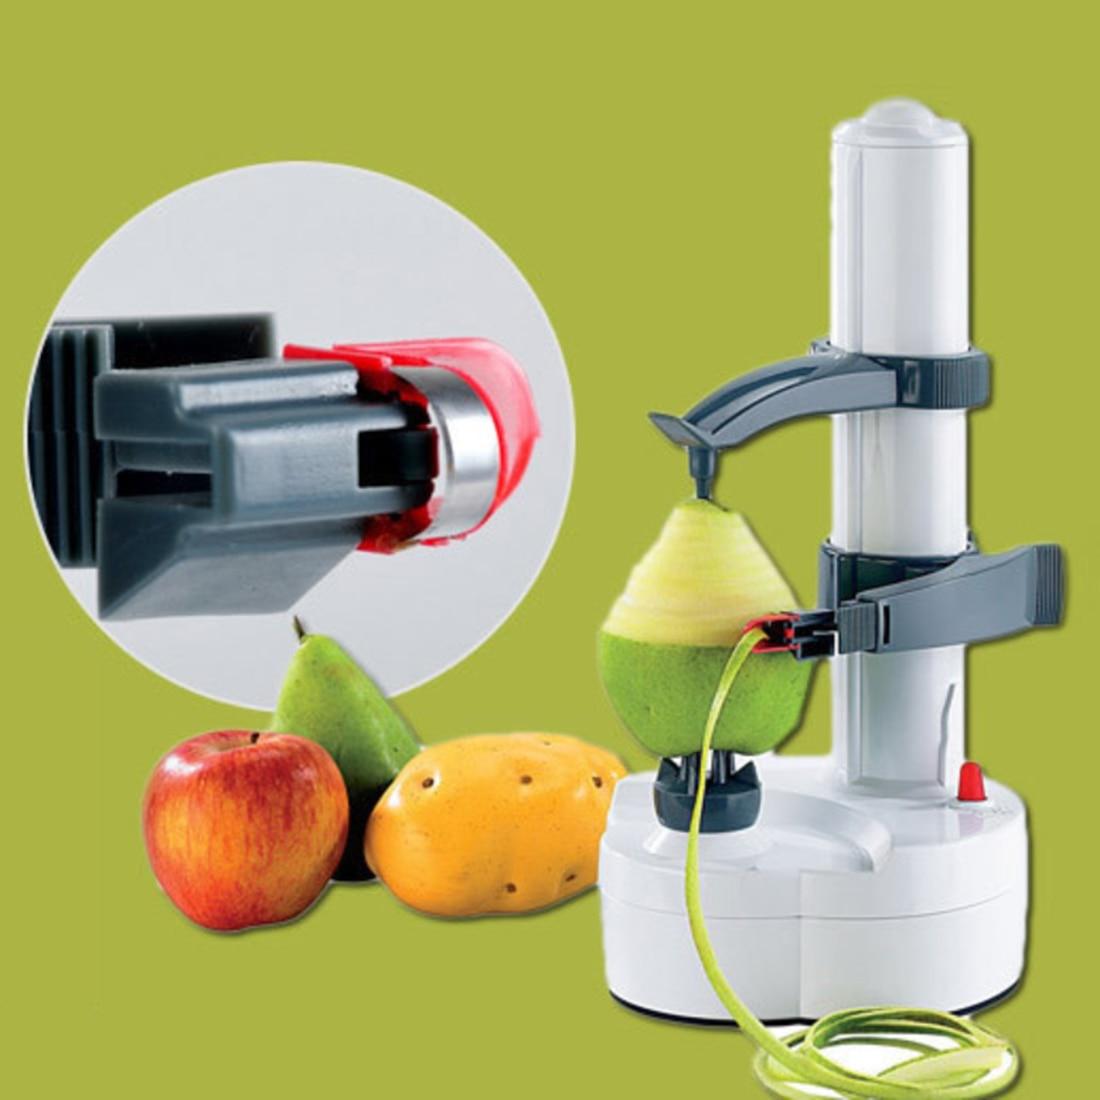 vegetable peeler machine